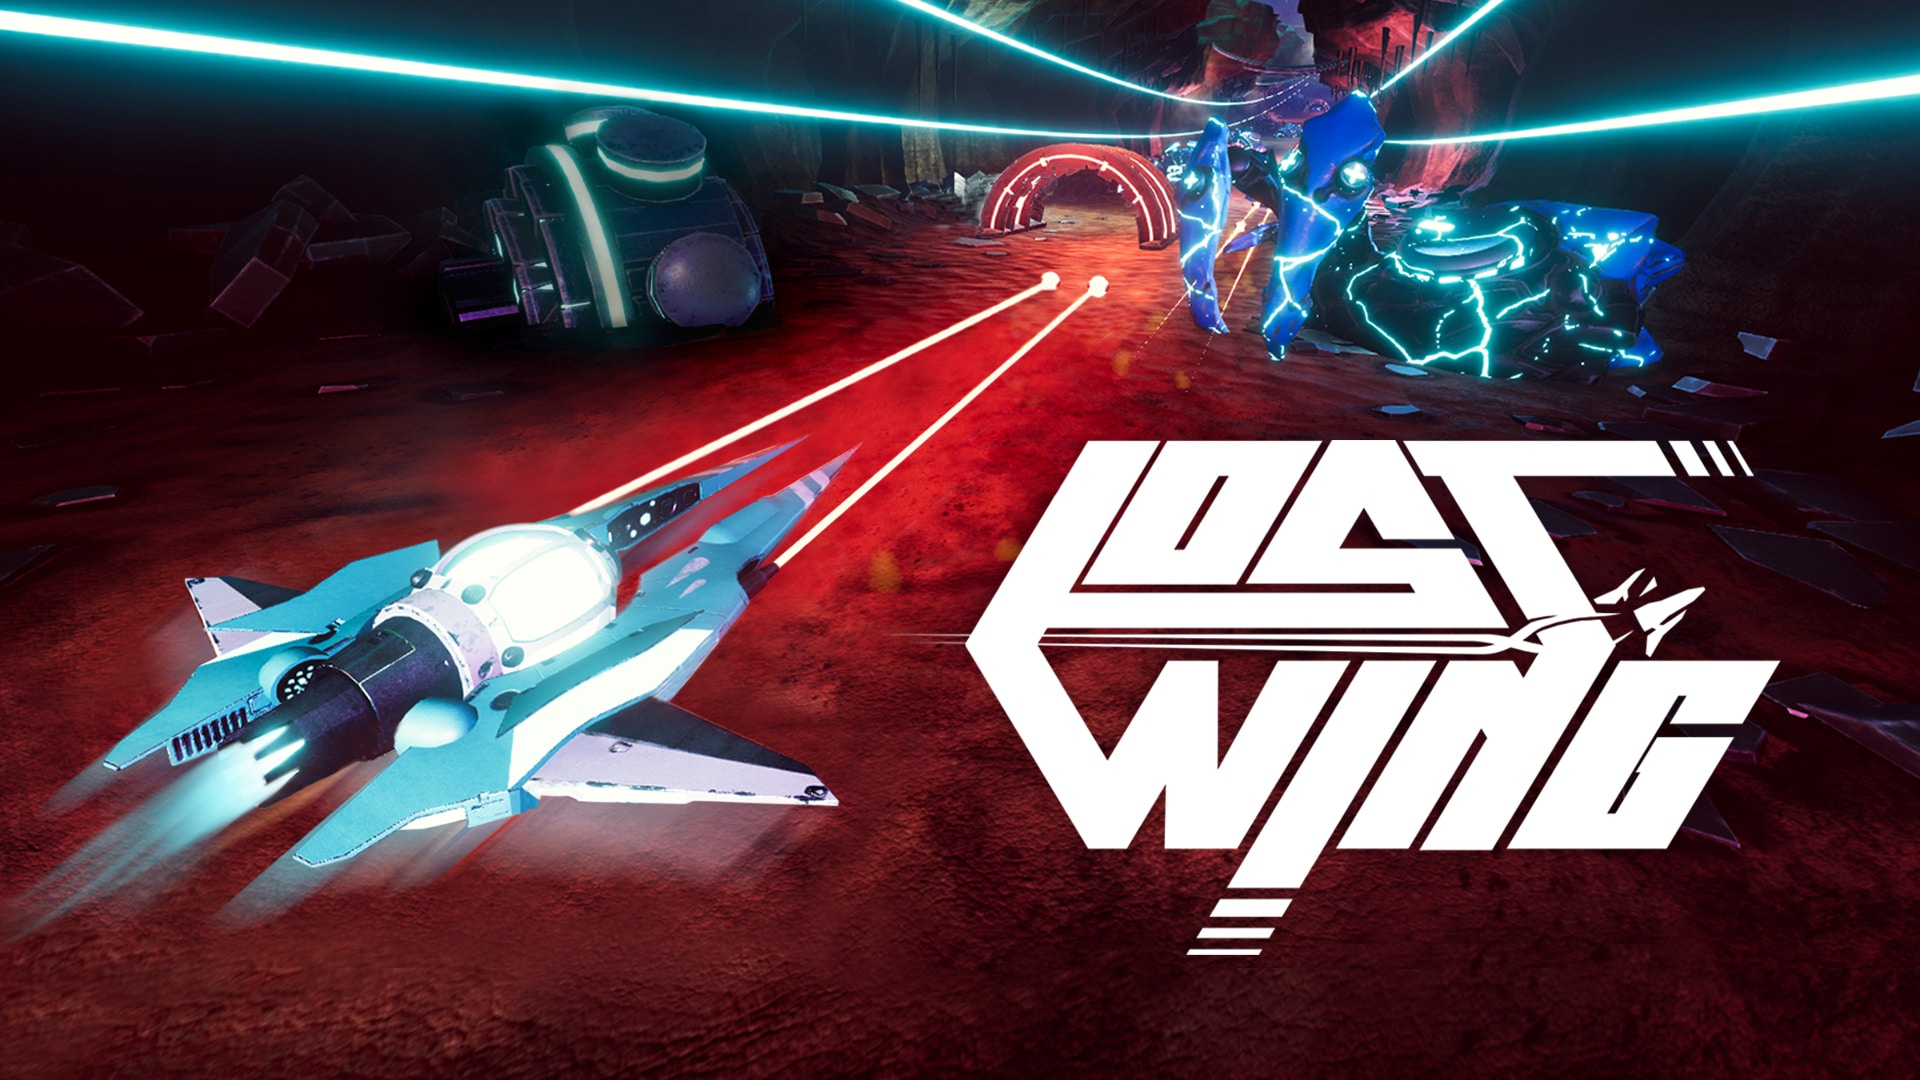 Lost Wing chega á PS4, Xbox One e Nintendo Switch dia 28 de julho